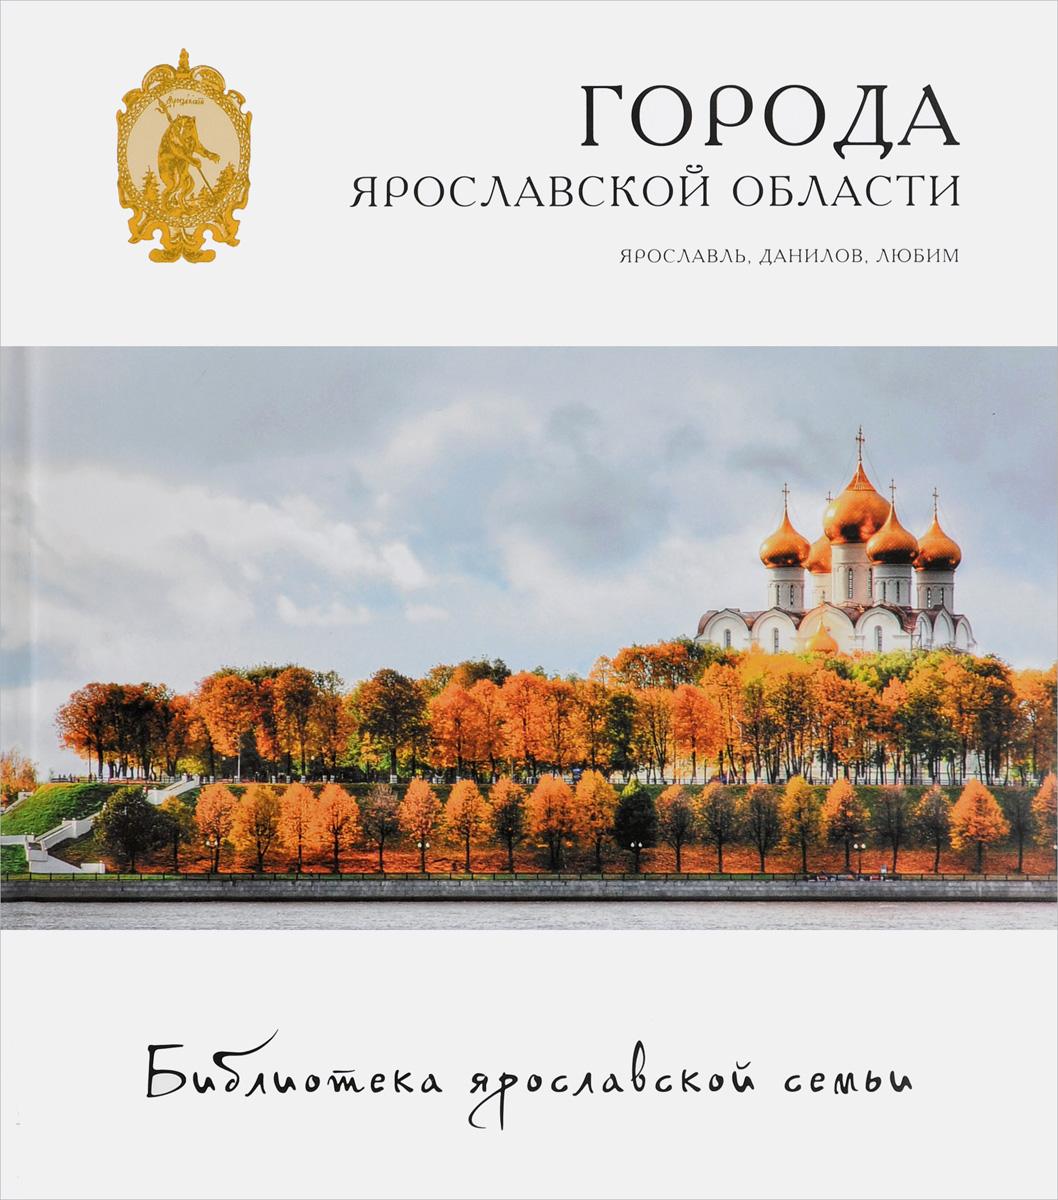 Мария Александрова, Андрей Данилов, Ян Левин Города Ярославской области. , Данилов, Любим